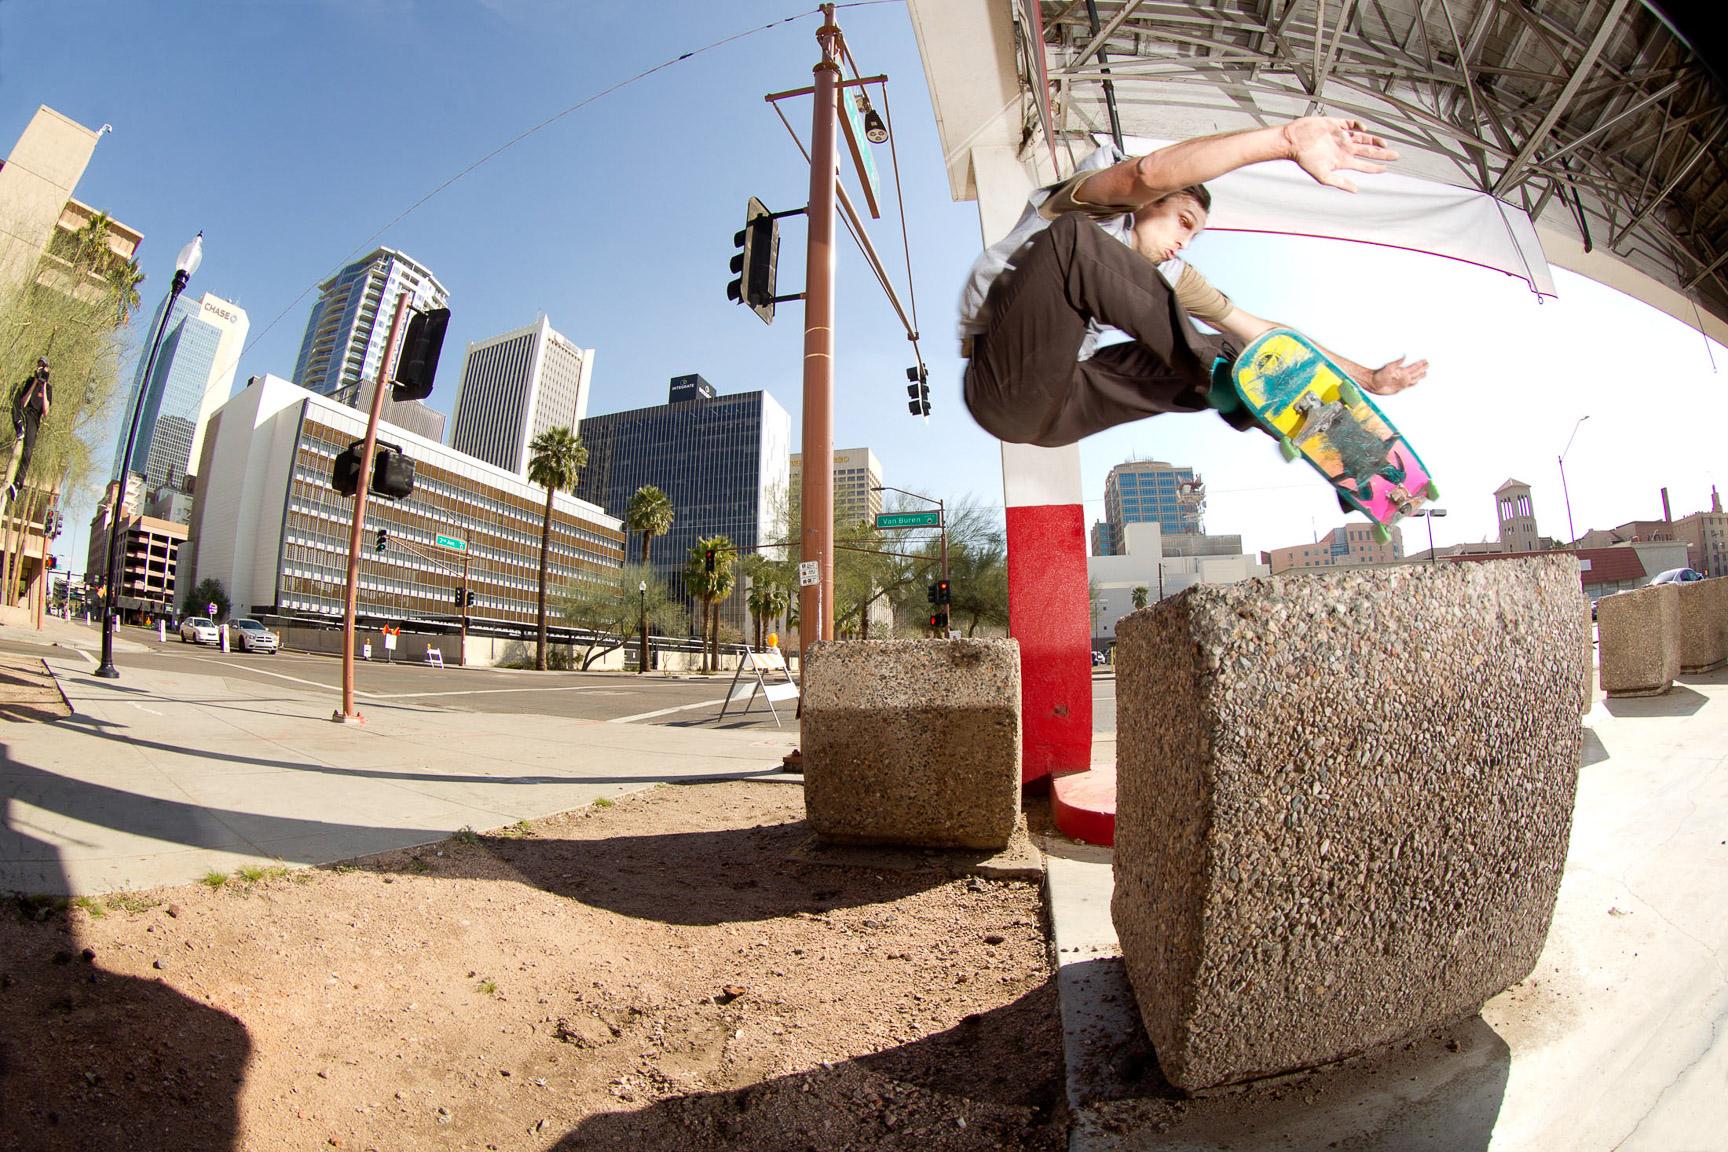 Will Blaty, Phoenix, Arizona